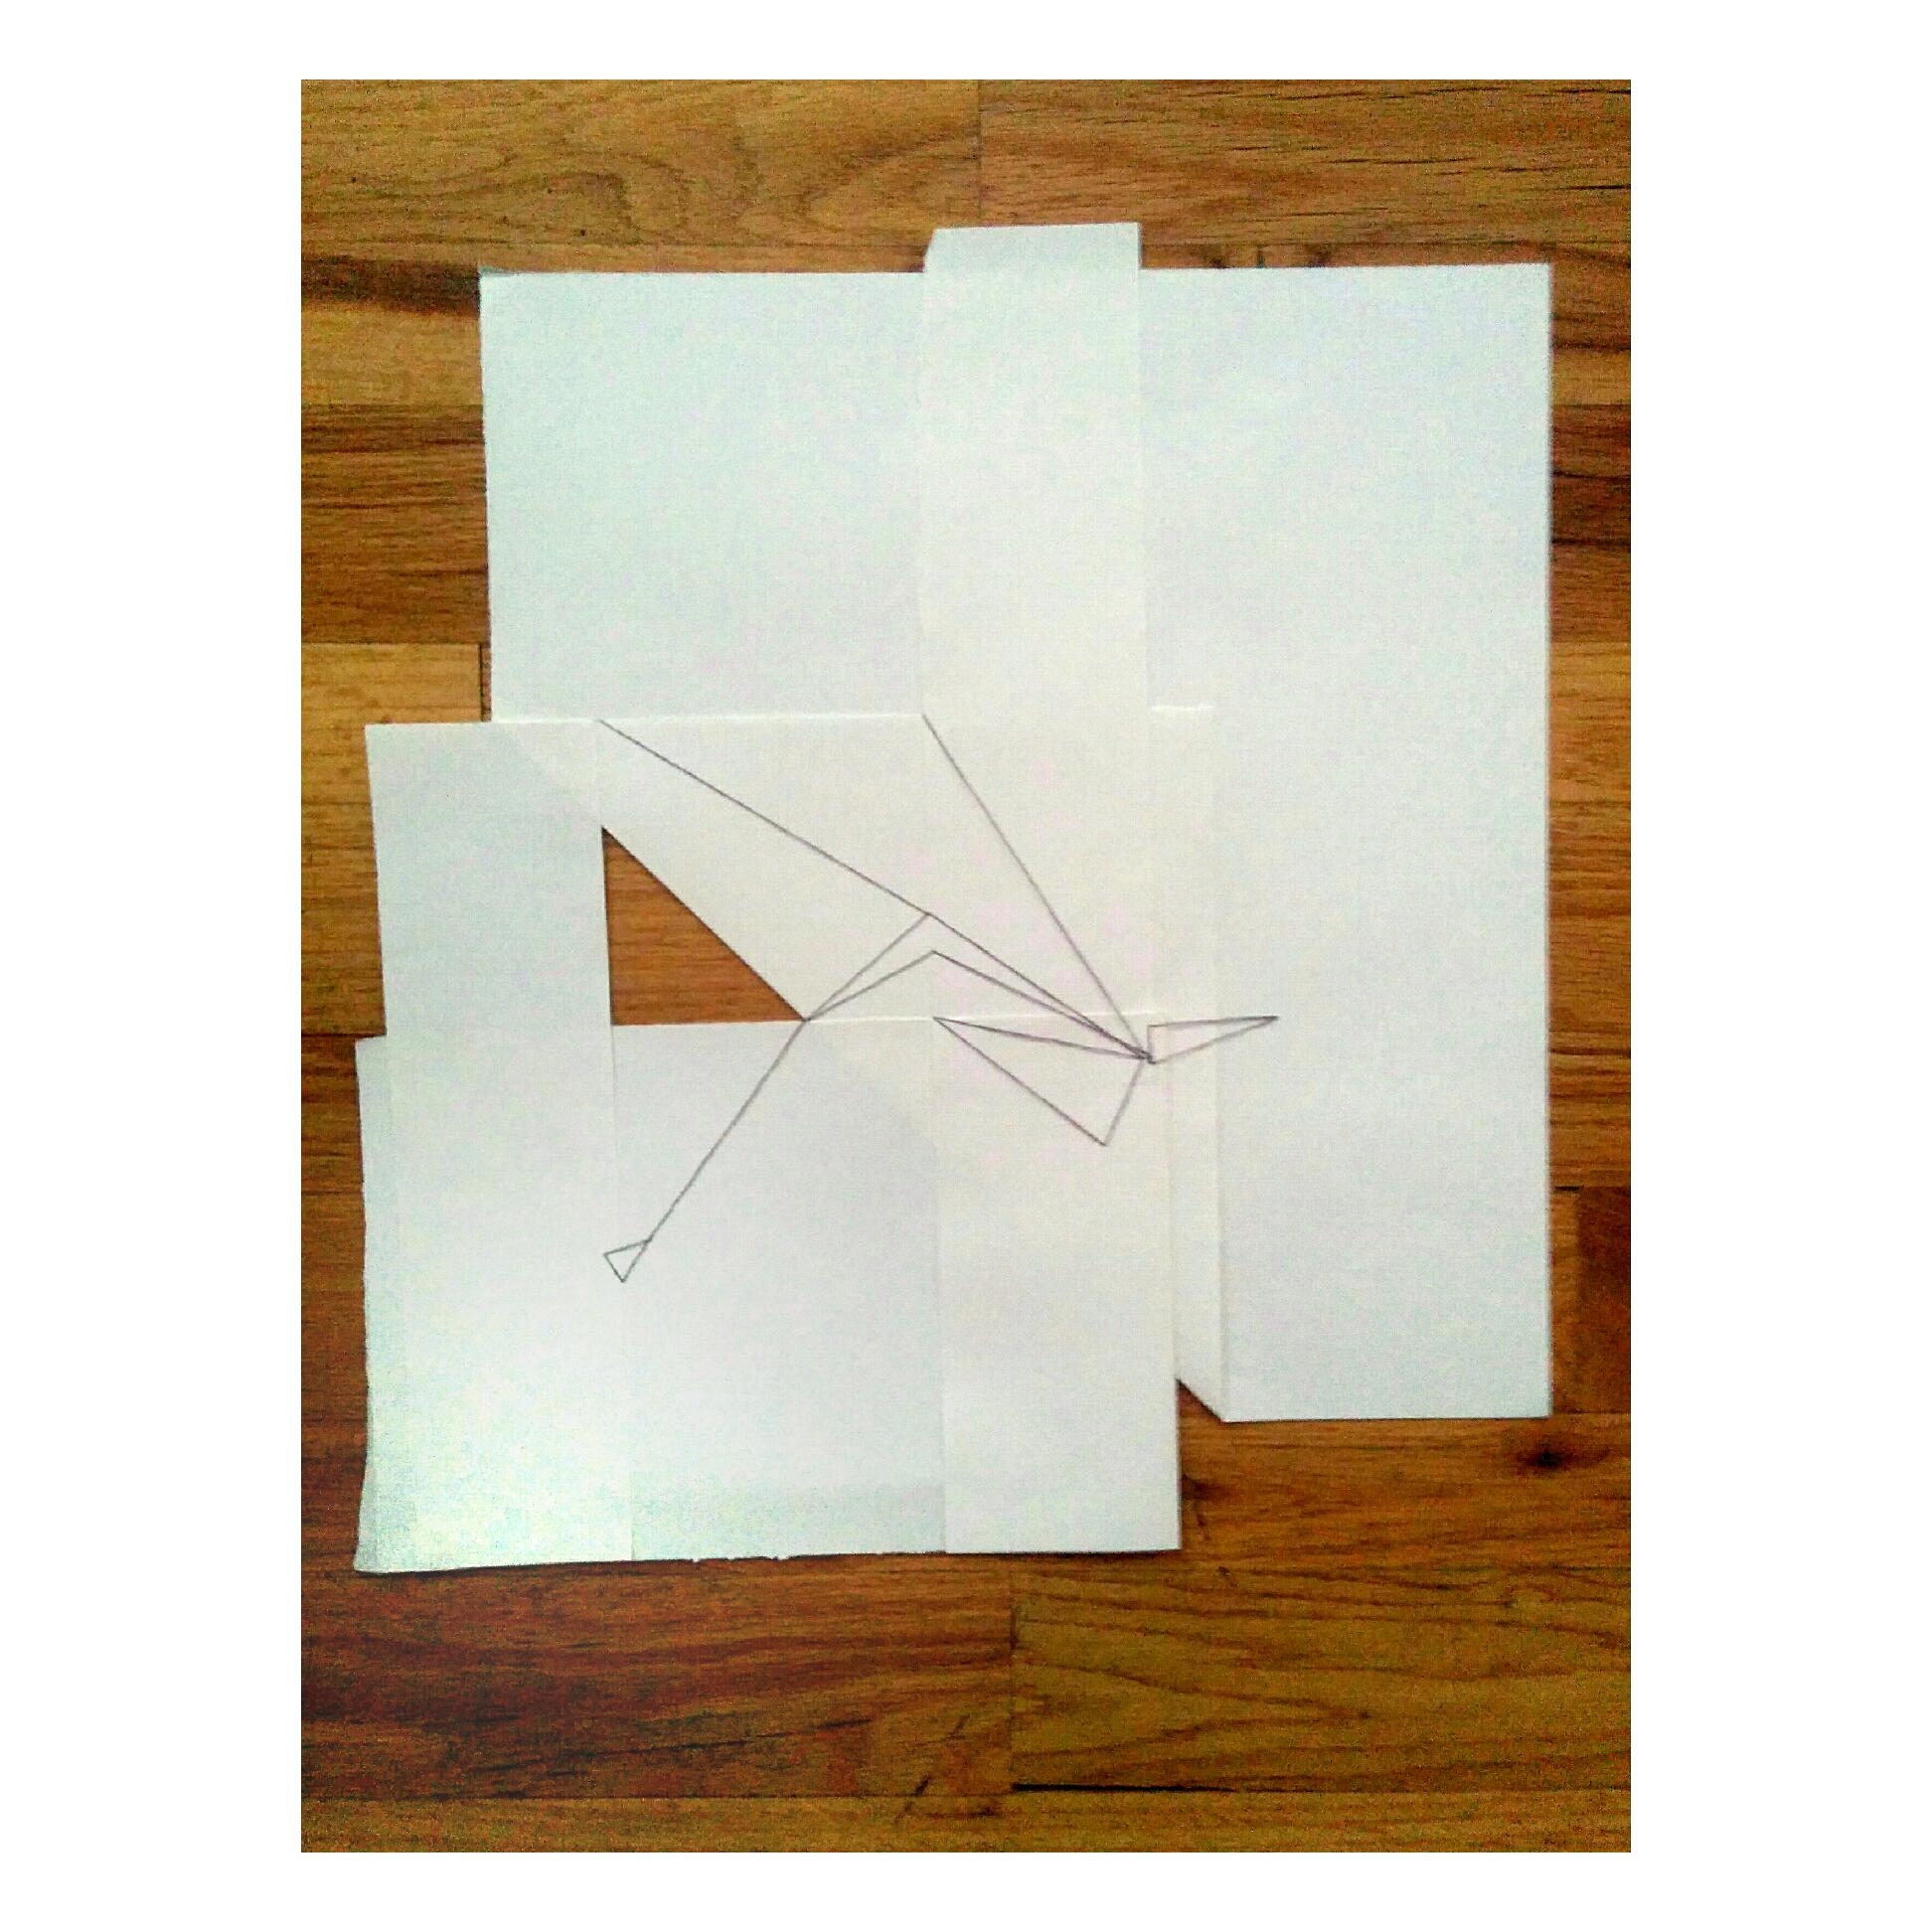 "Triangle Illusion Full  Irregular ~17"" x 17"", paper, wood, and thread"